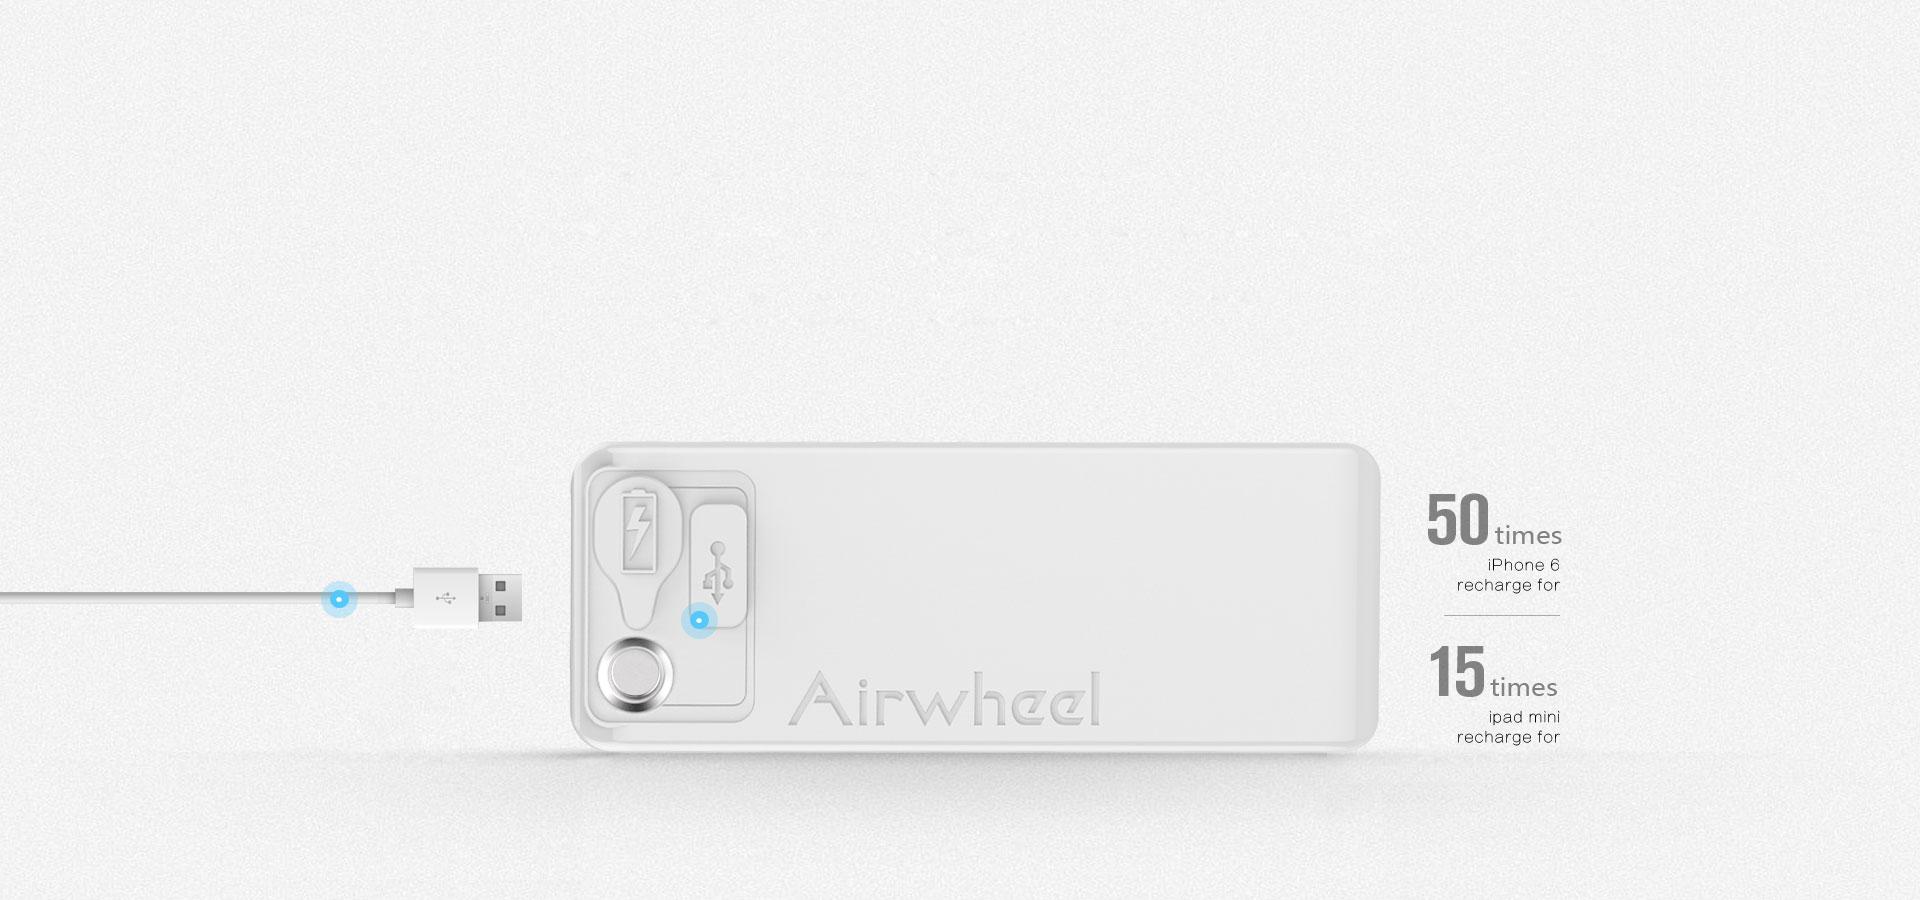 Airwheel USB